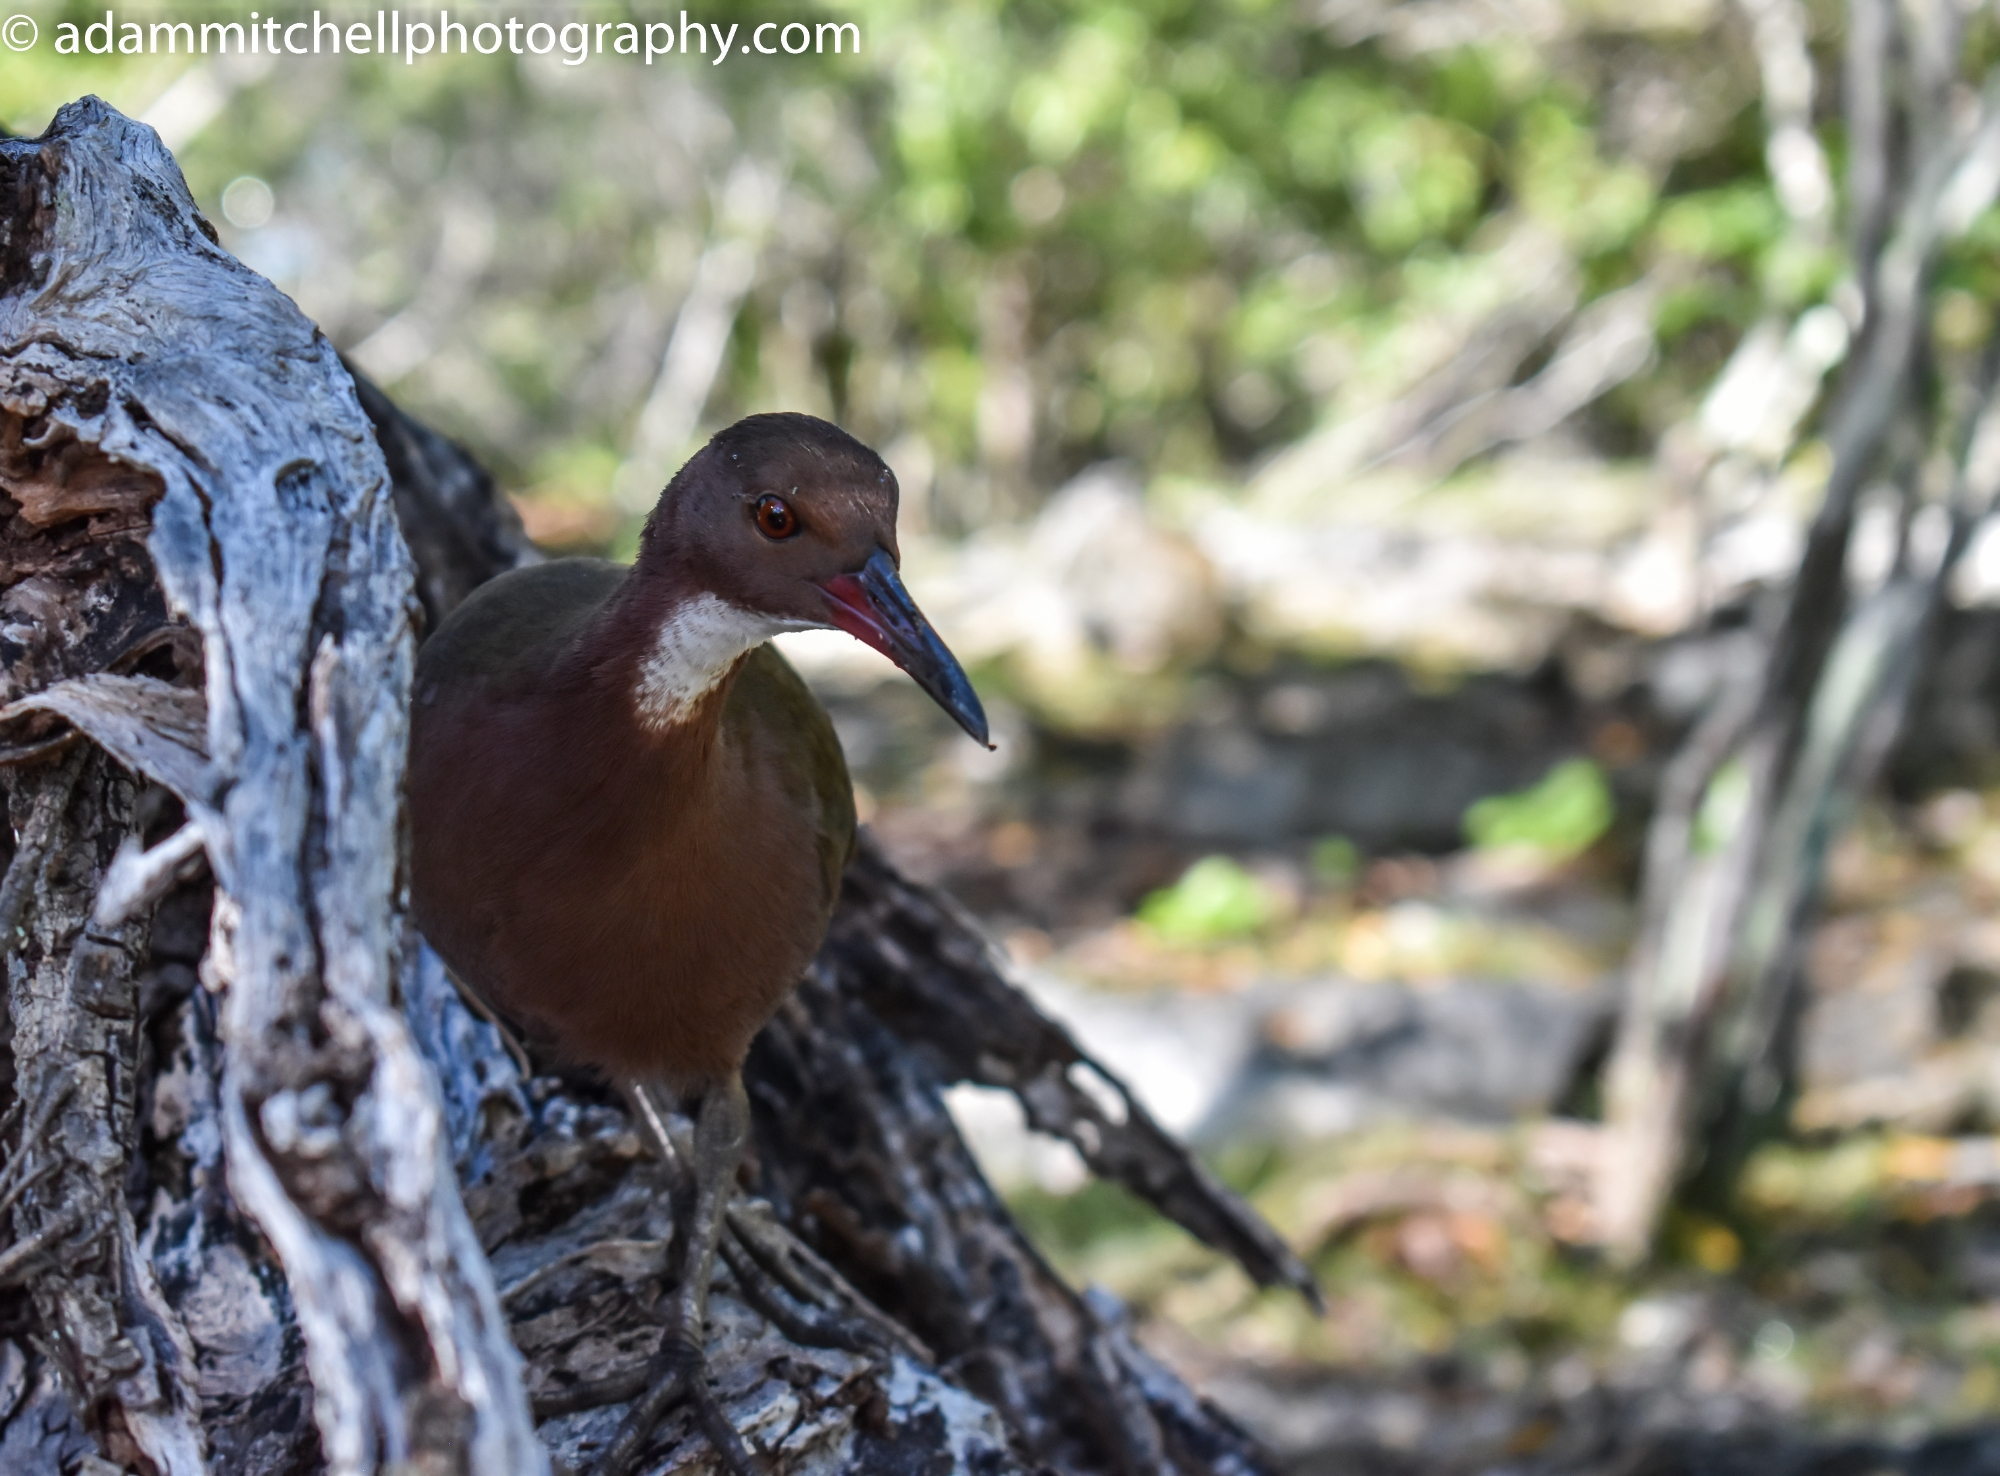 Aldabran flightless rail